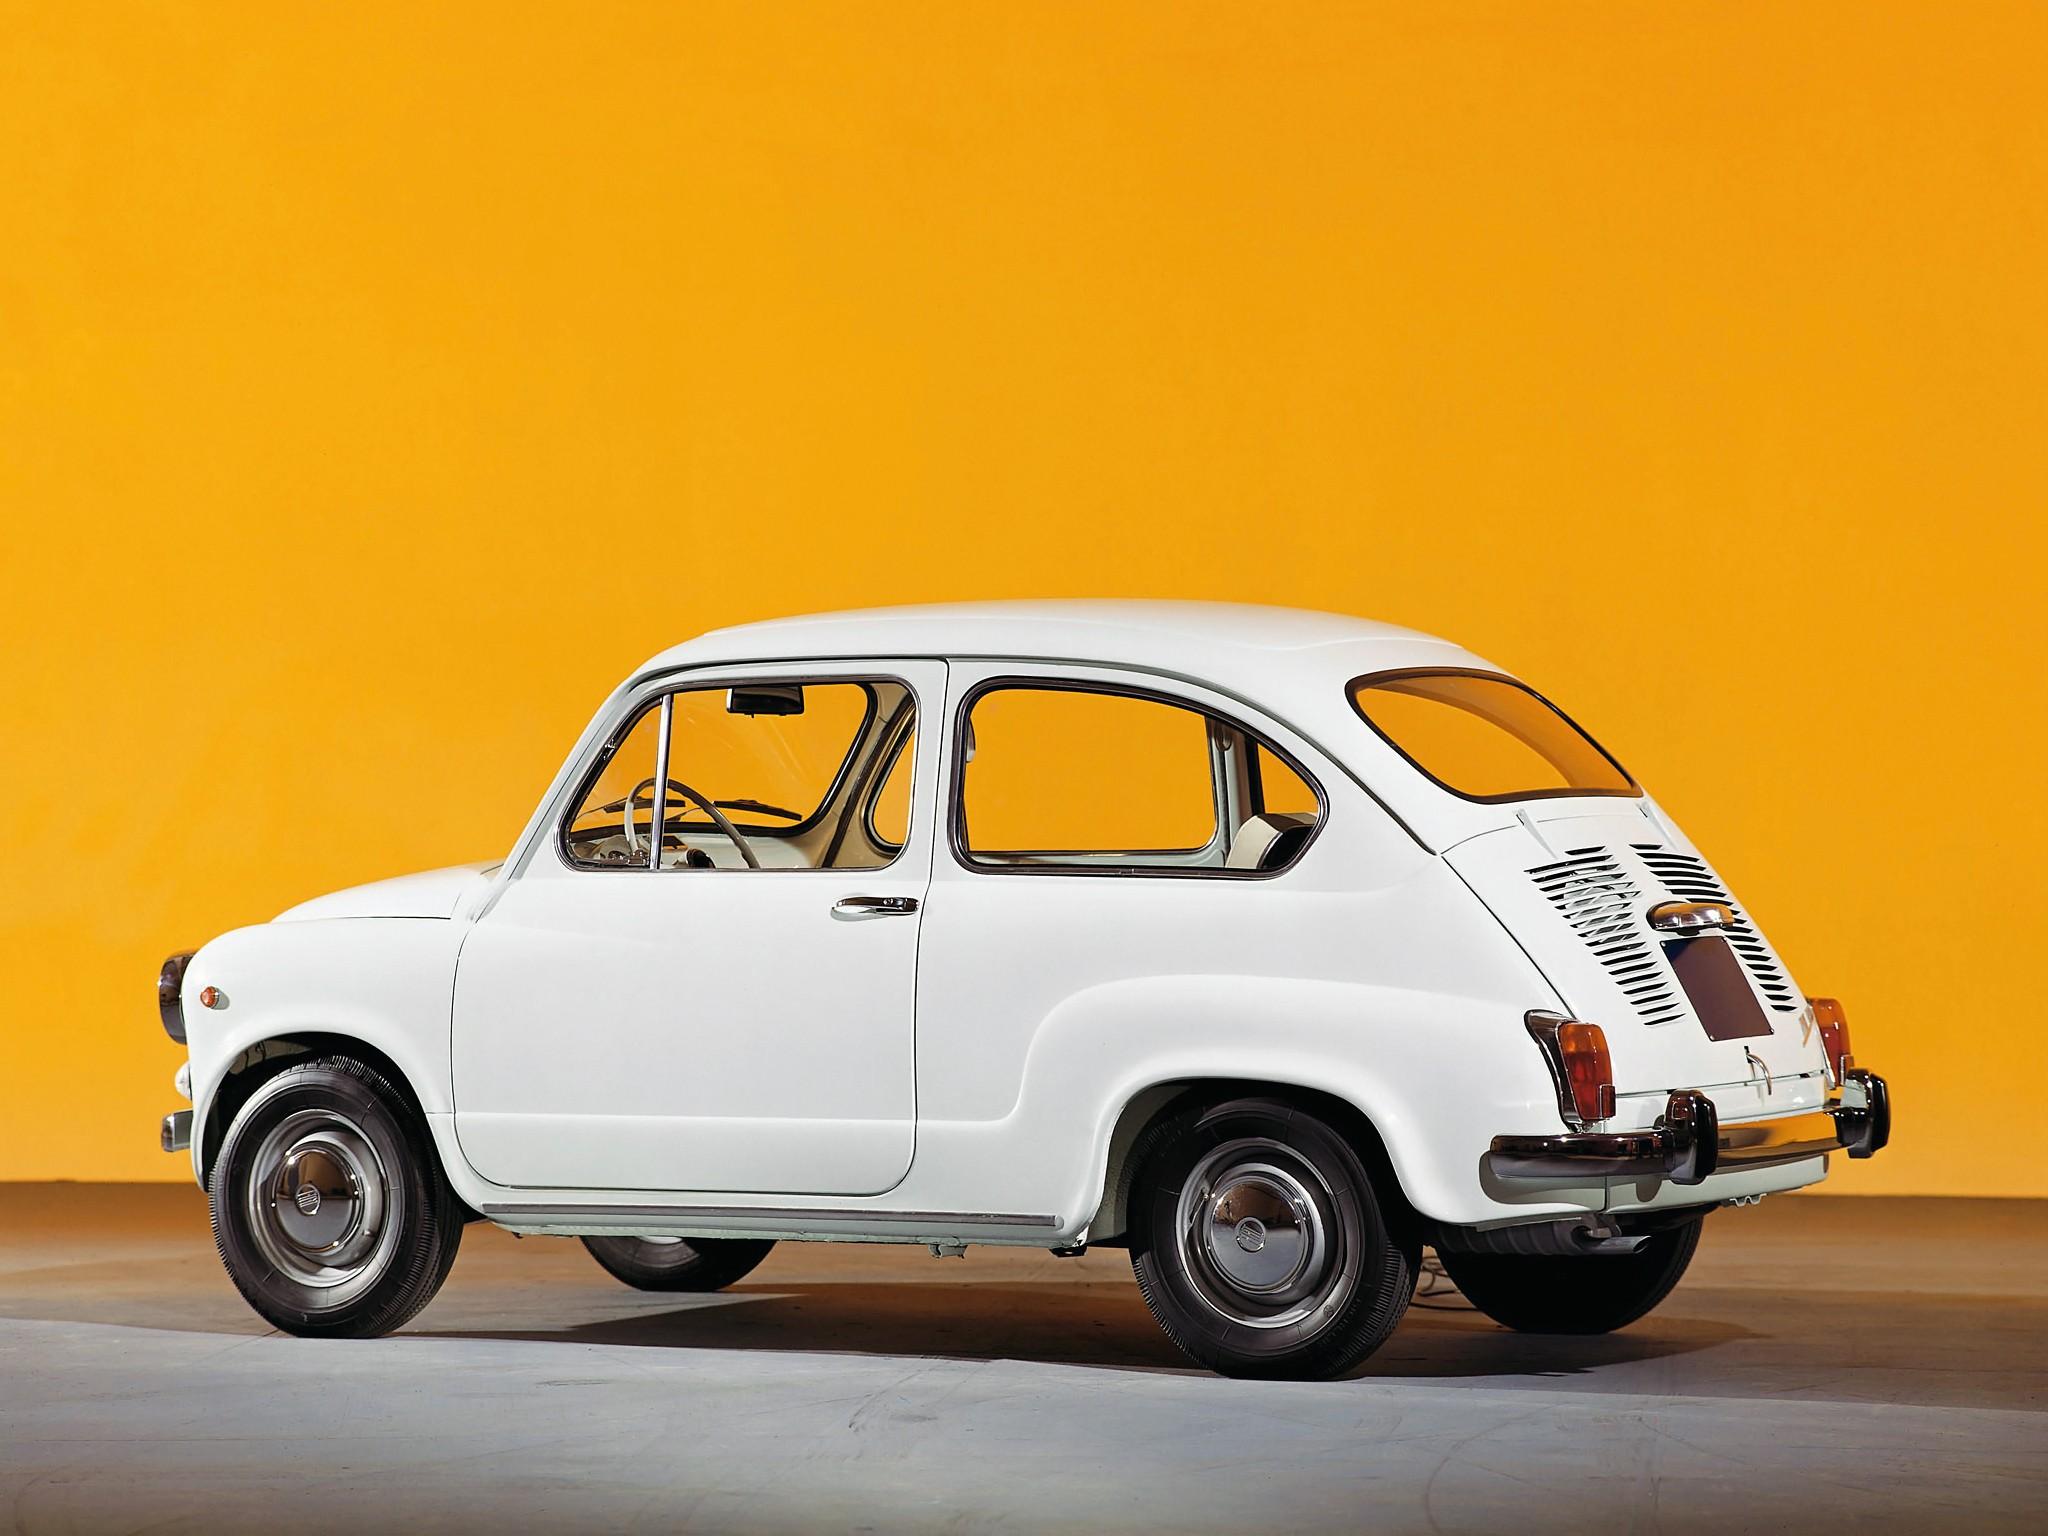 Next-Generation Fiat 500 Could Get Four-Door Version Named 600 ...